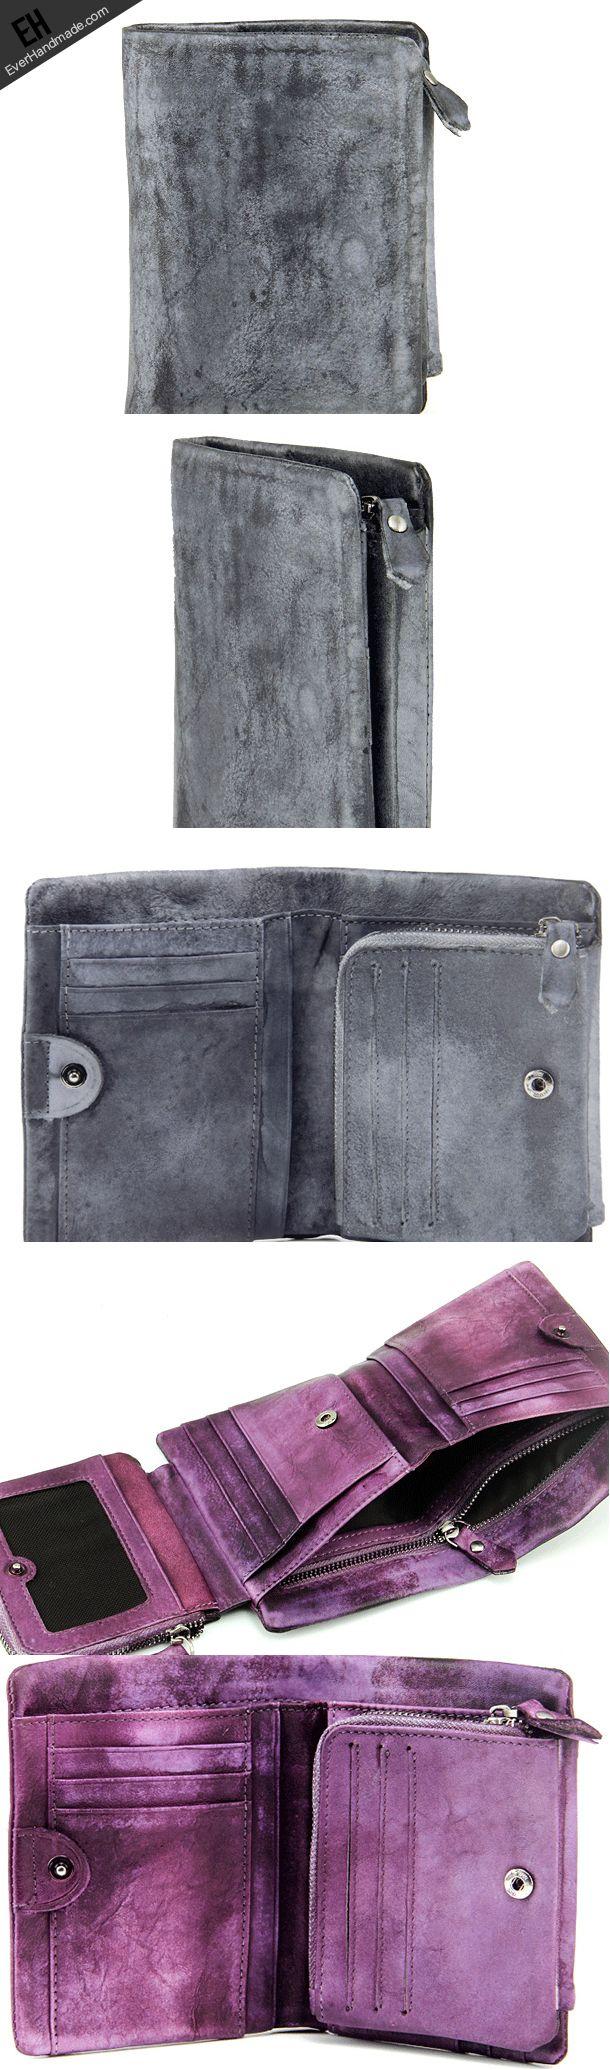 Handmade men short leather wallet men vintage brown gray purple wallet for him